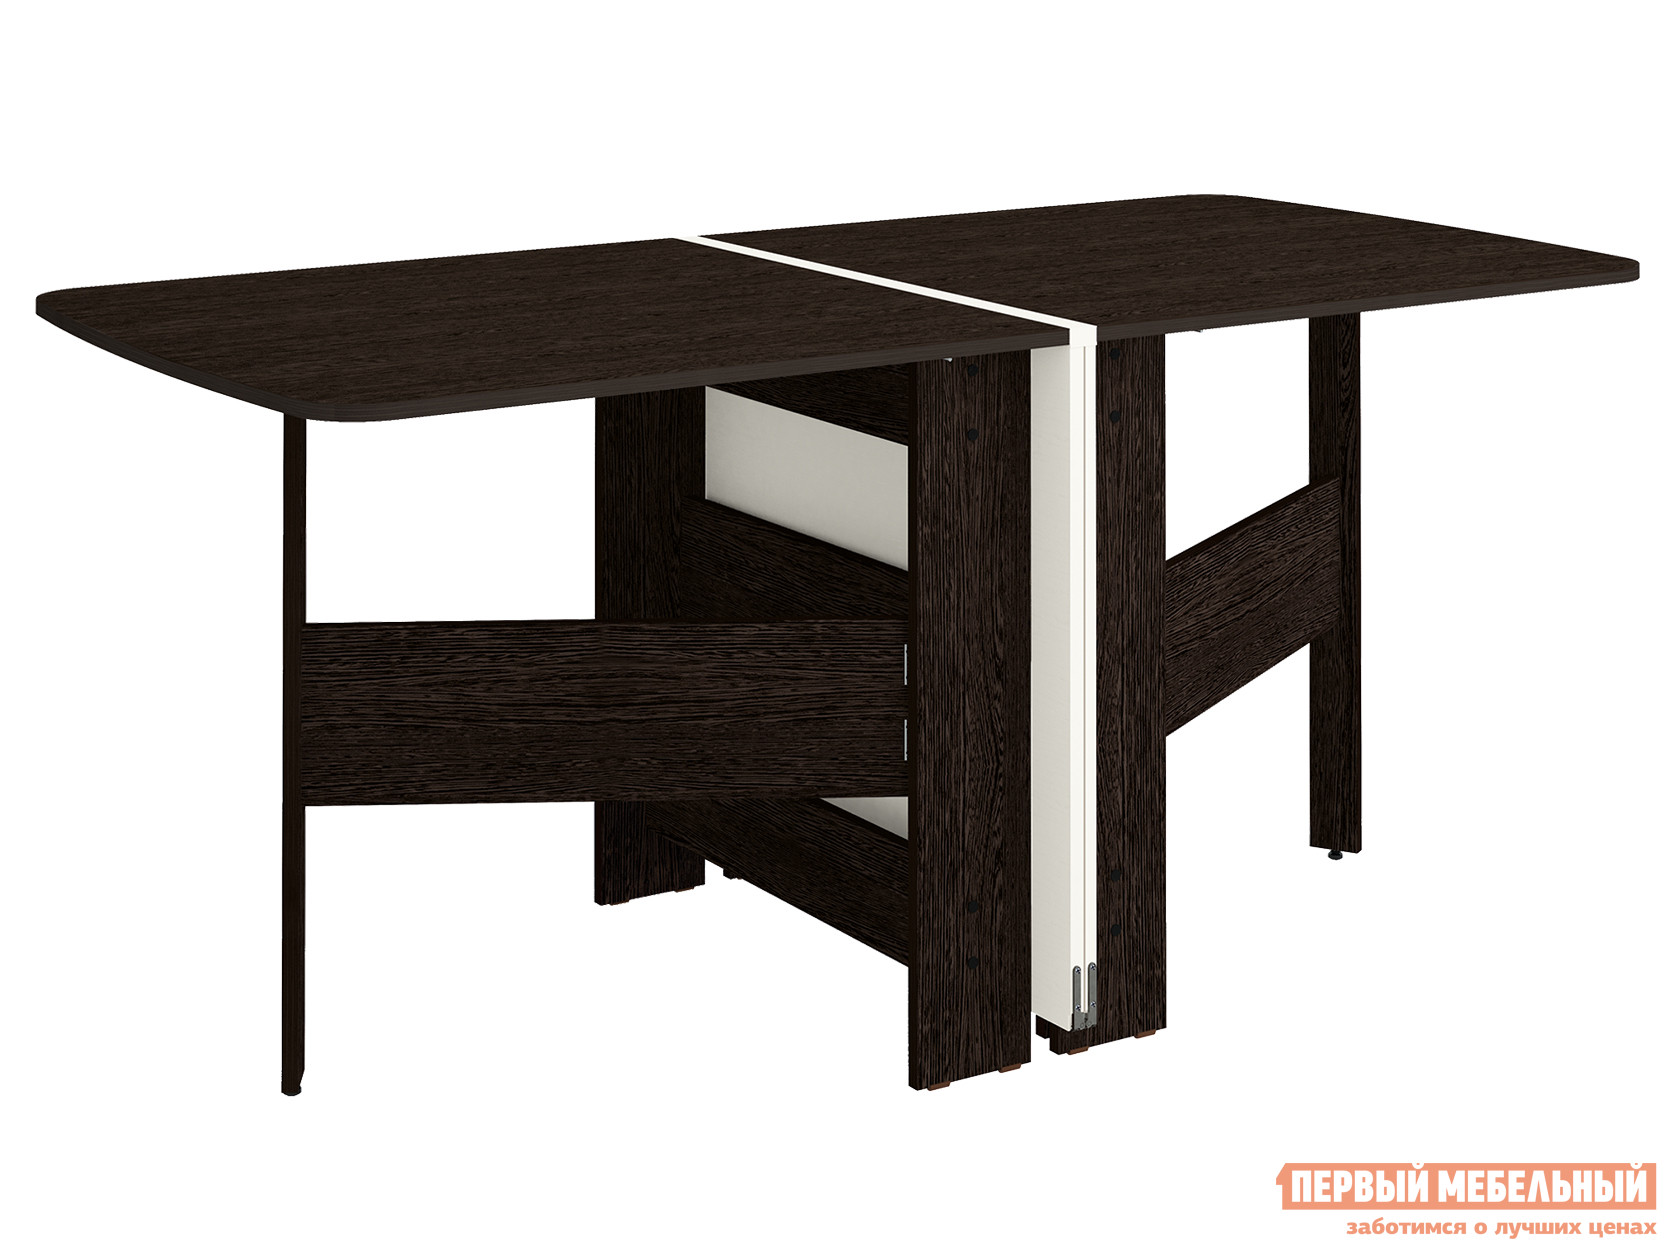 Стол-книжка Витра Колибри-13 обеденный стол витра орфей 21